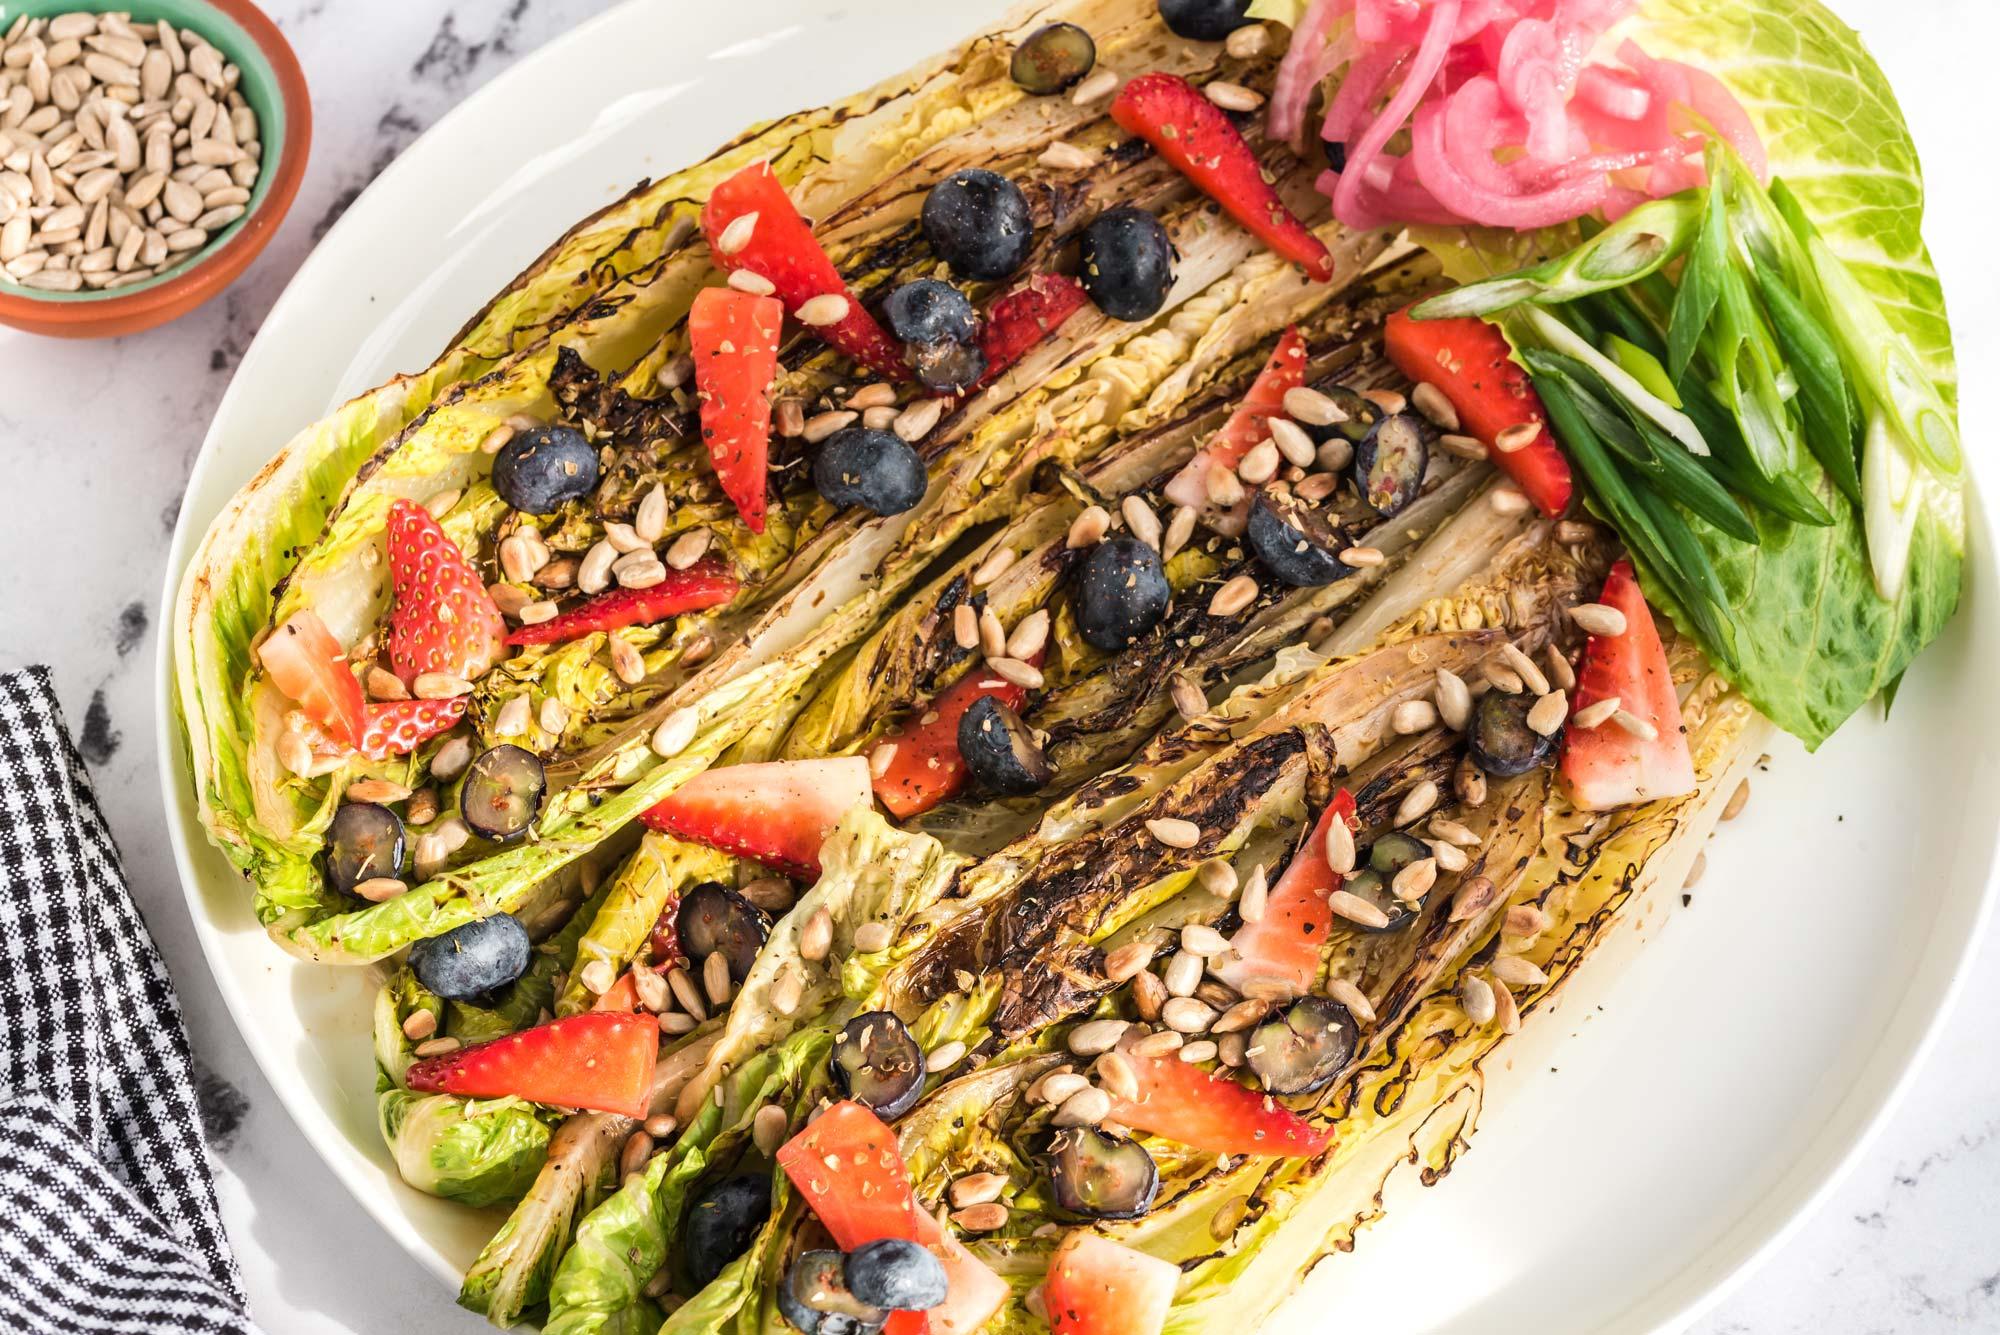 grilled romaine sunflower seed salad on plate